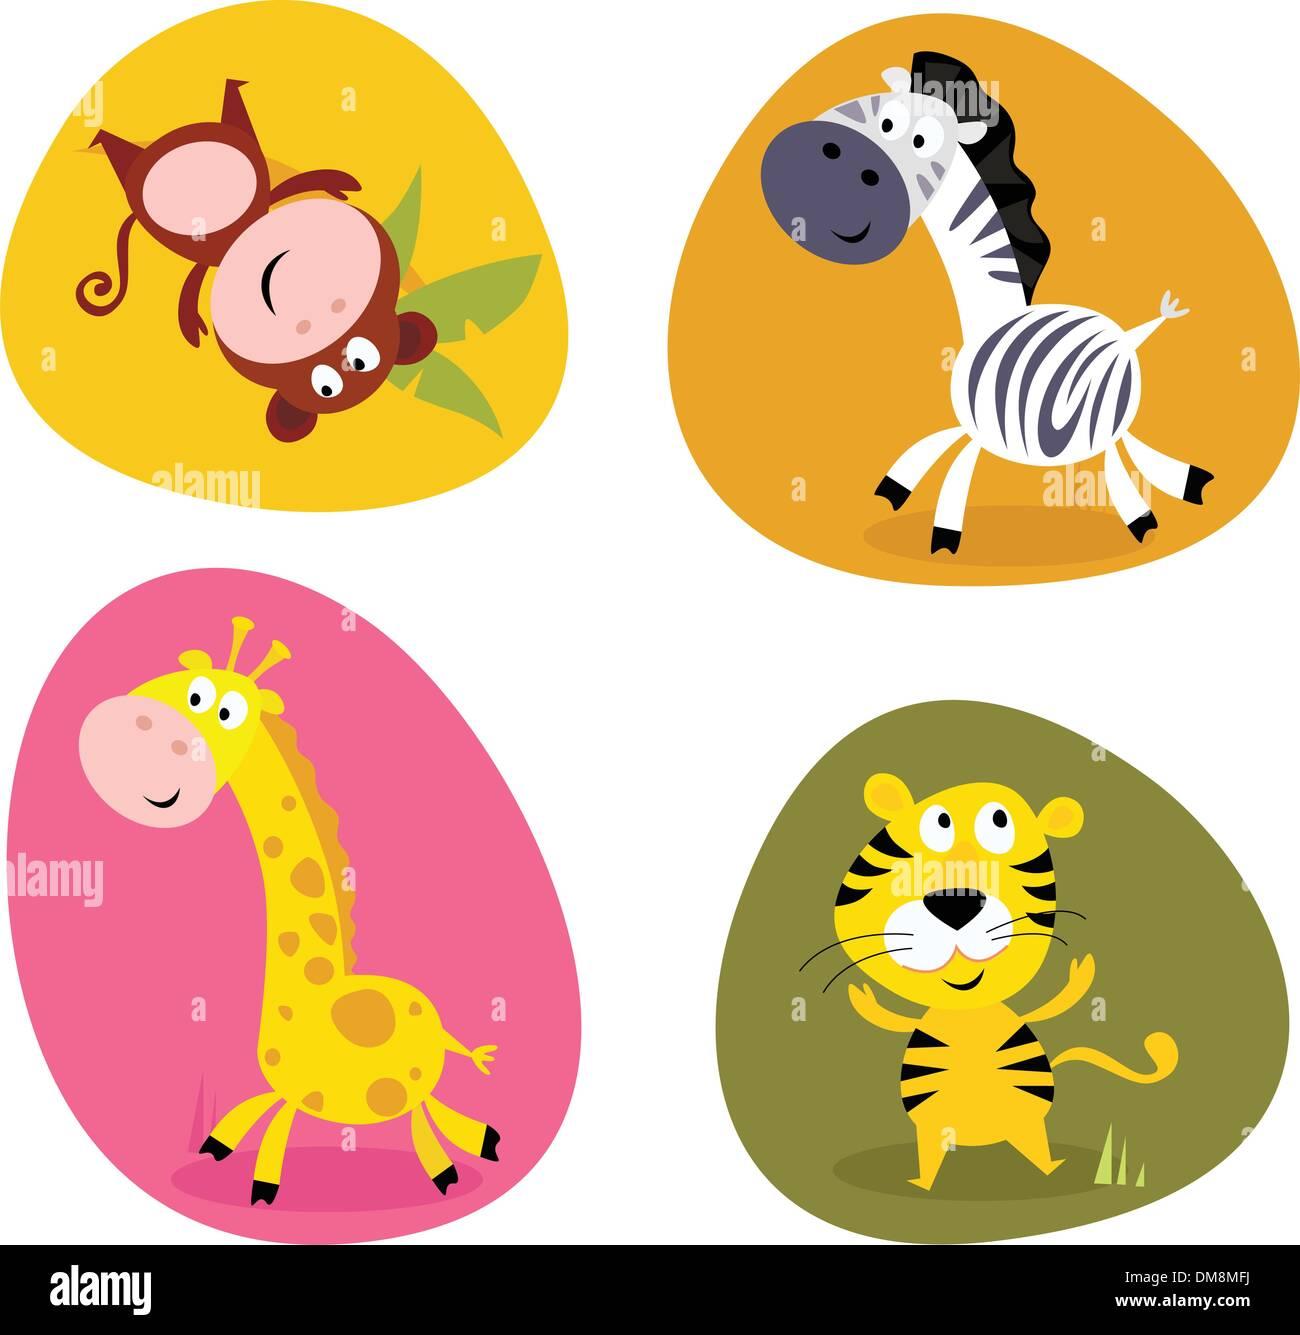 Illustration set of cute safari animals: monkey, tiger, giraffe and zebra Stock Vector